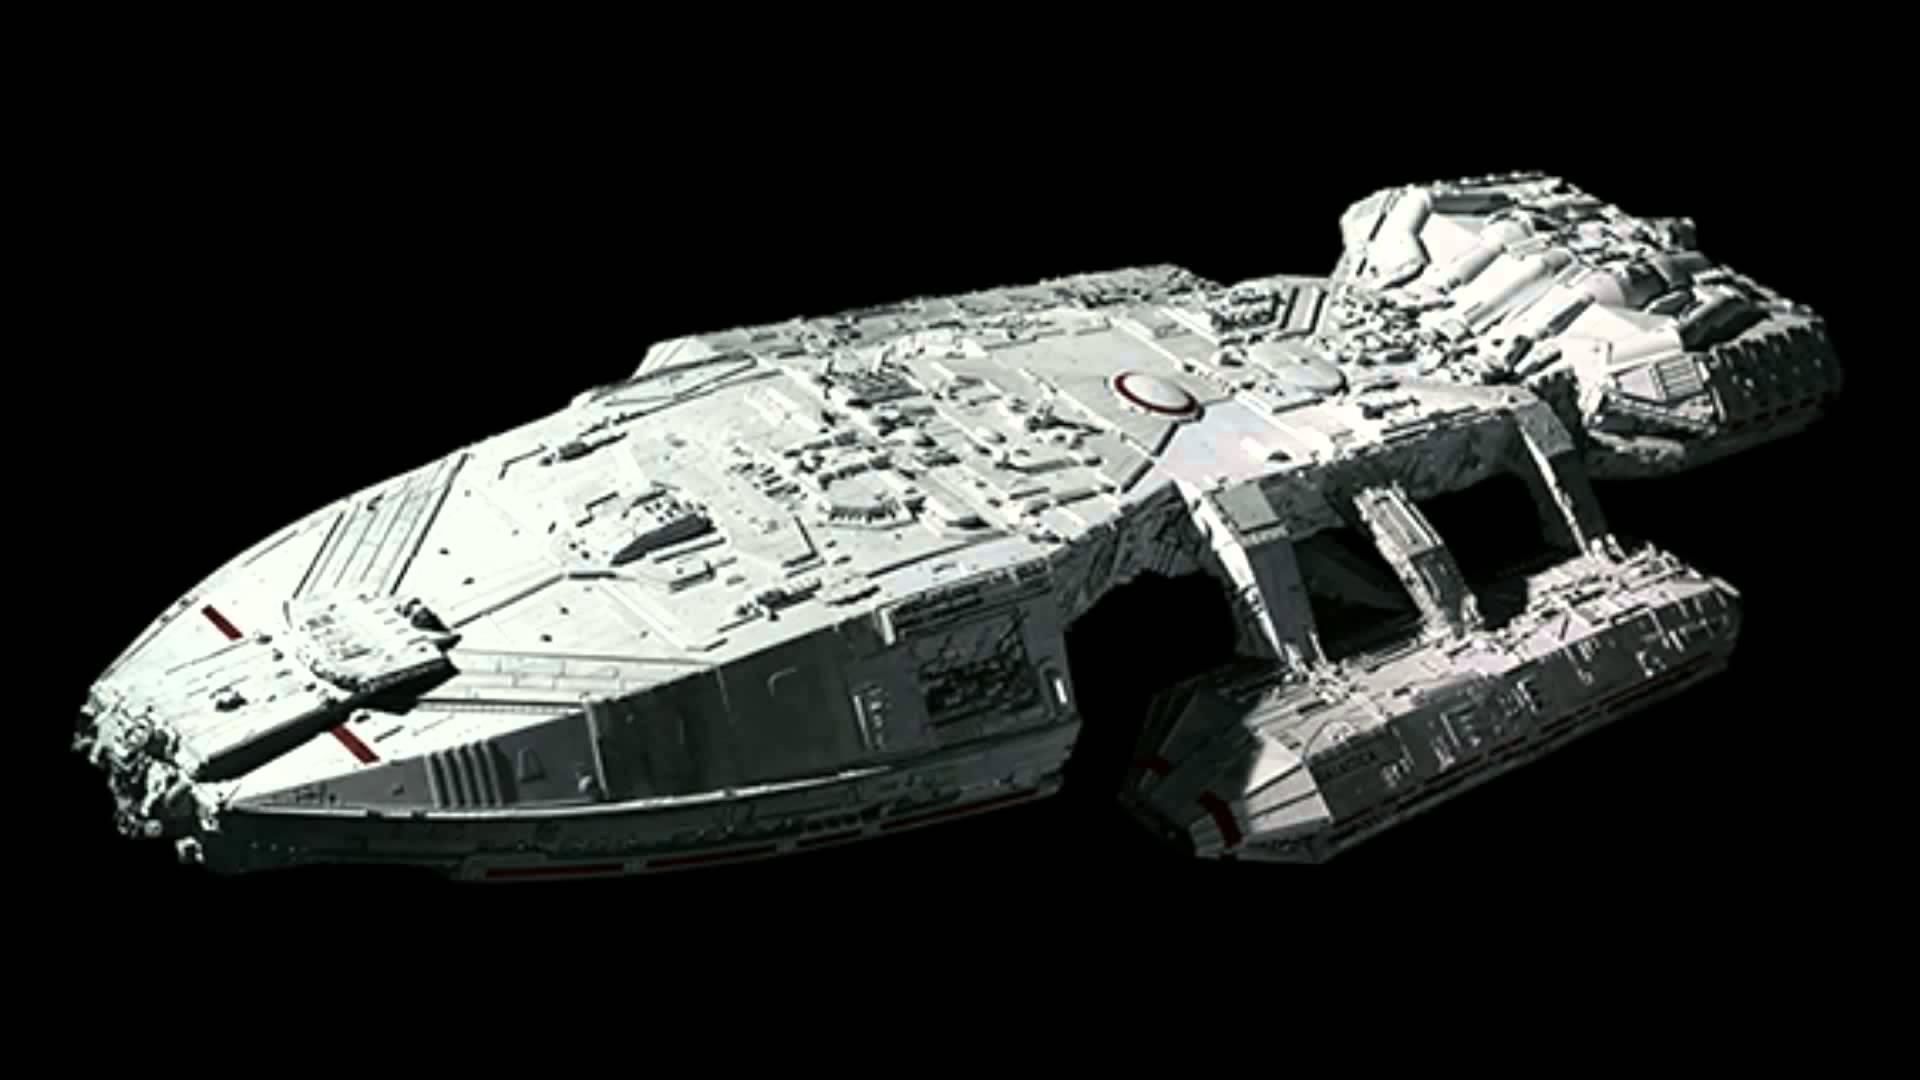 The Battlestar Galactica in Battlestar Galactica (1978)